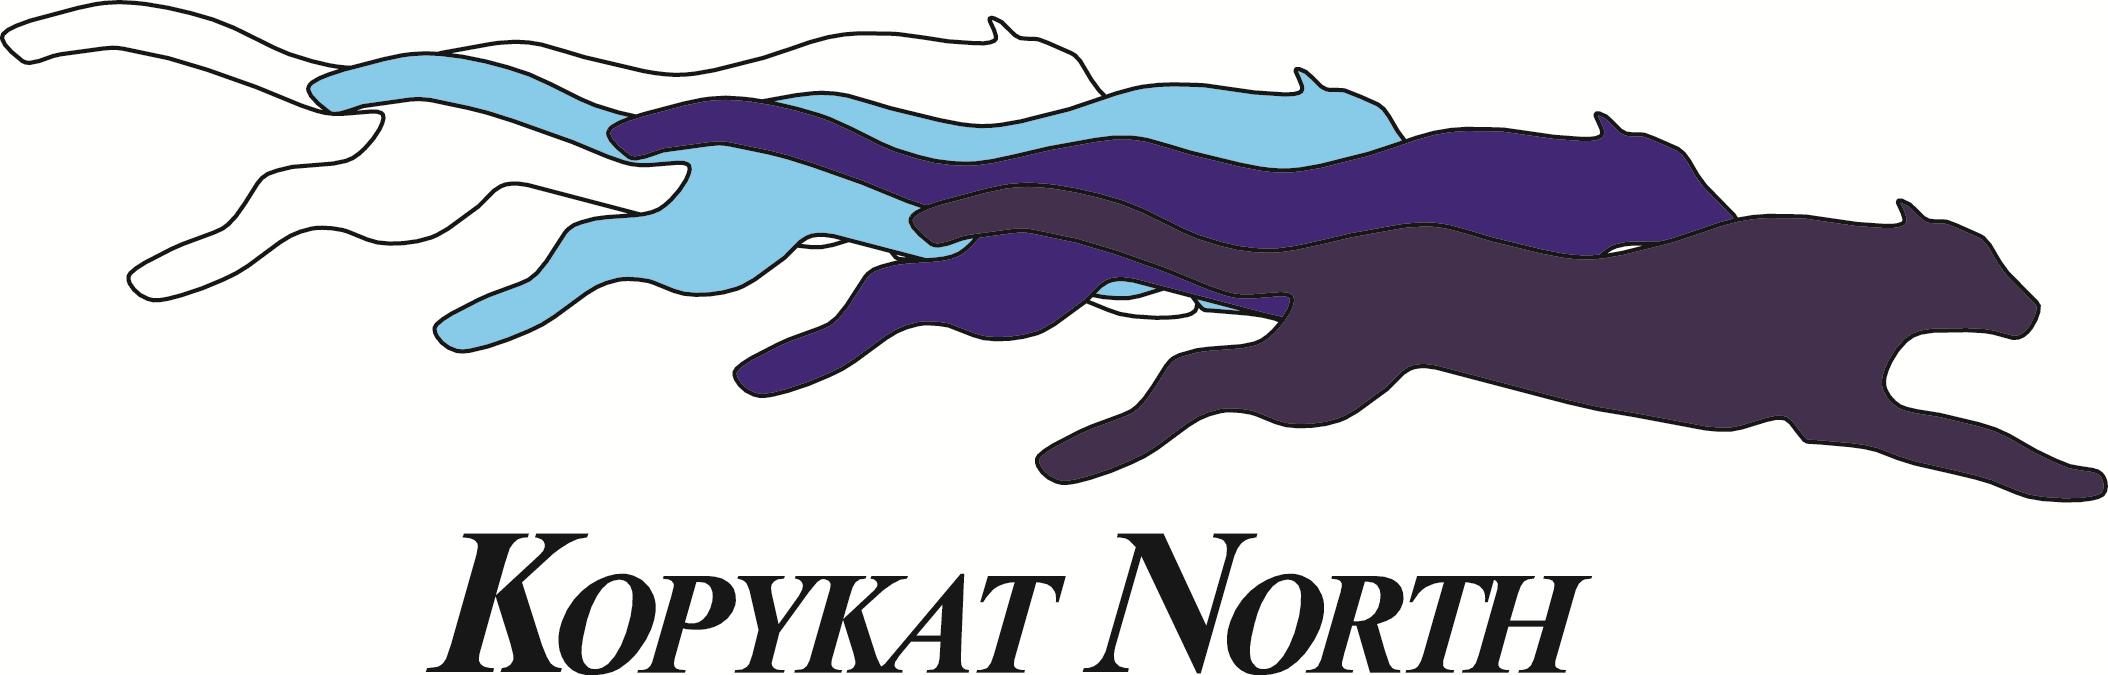 KopyKat Logo [Converted]